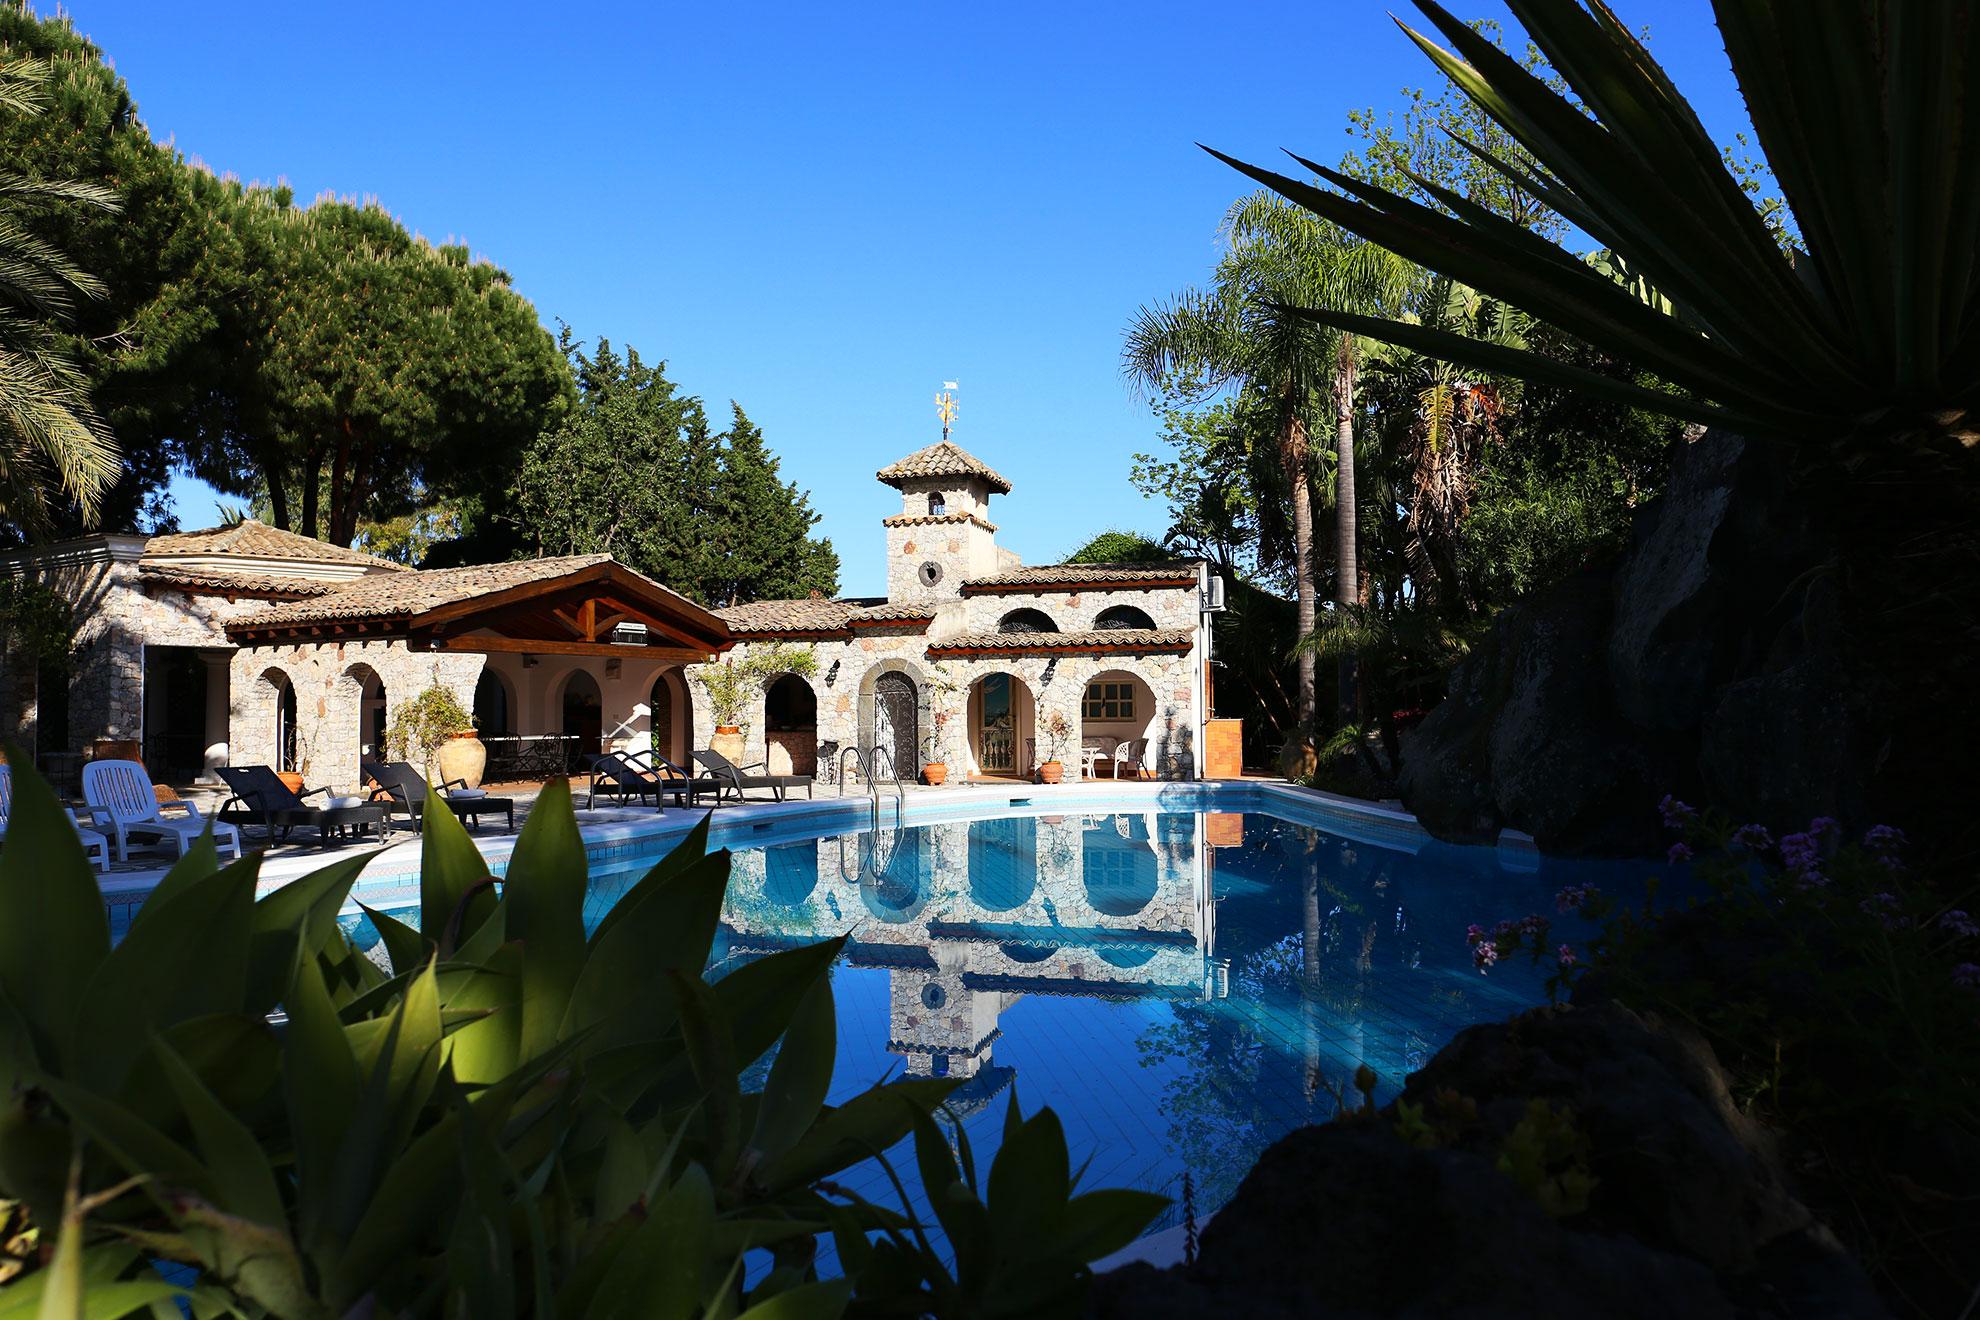 La villa giardini naxos u bed and breakfast giardini naxos